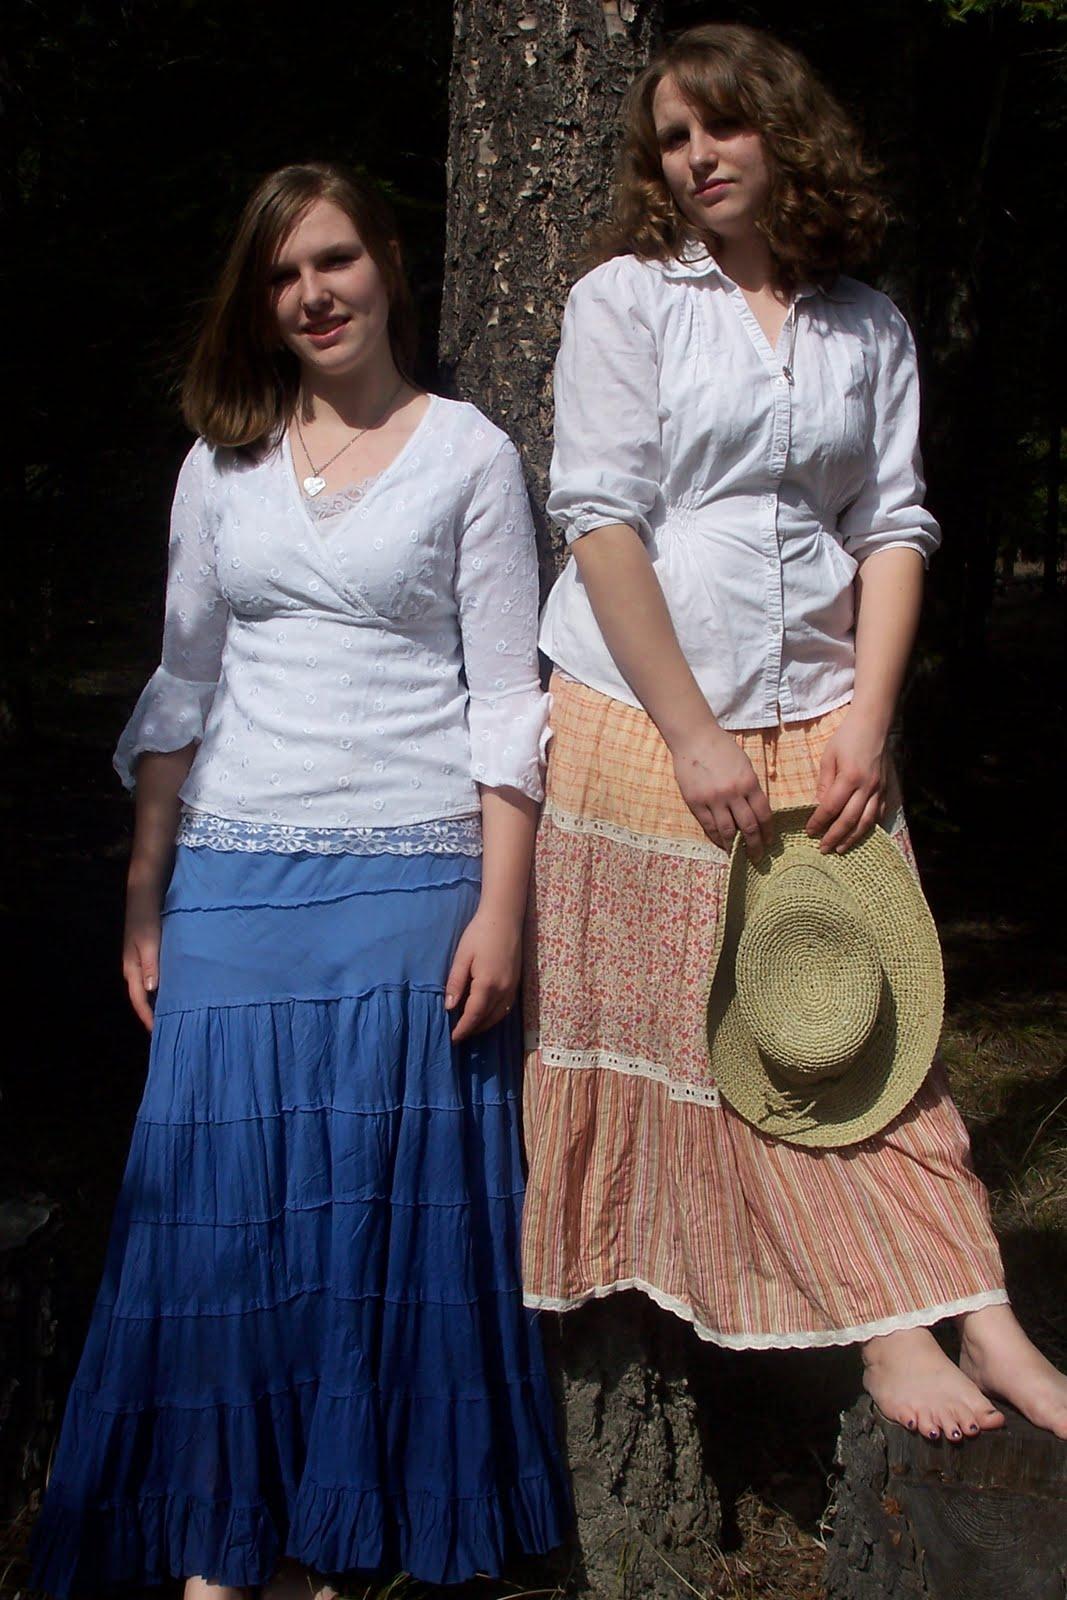 feminine mens clothing - photo #24